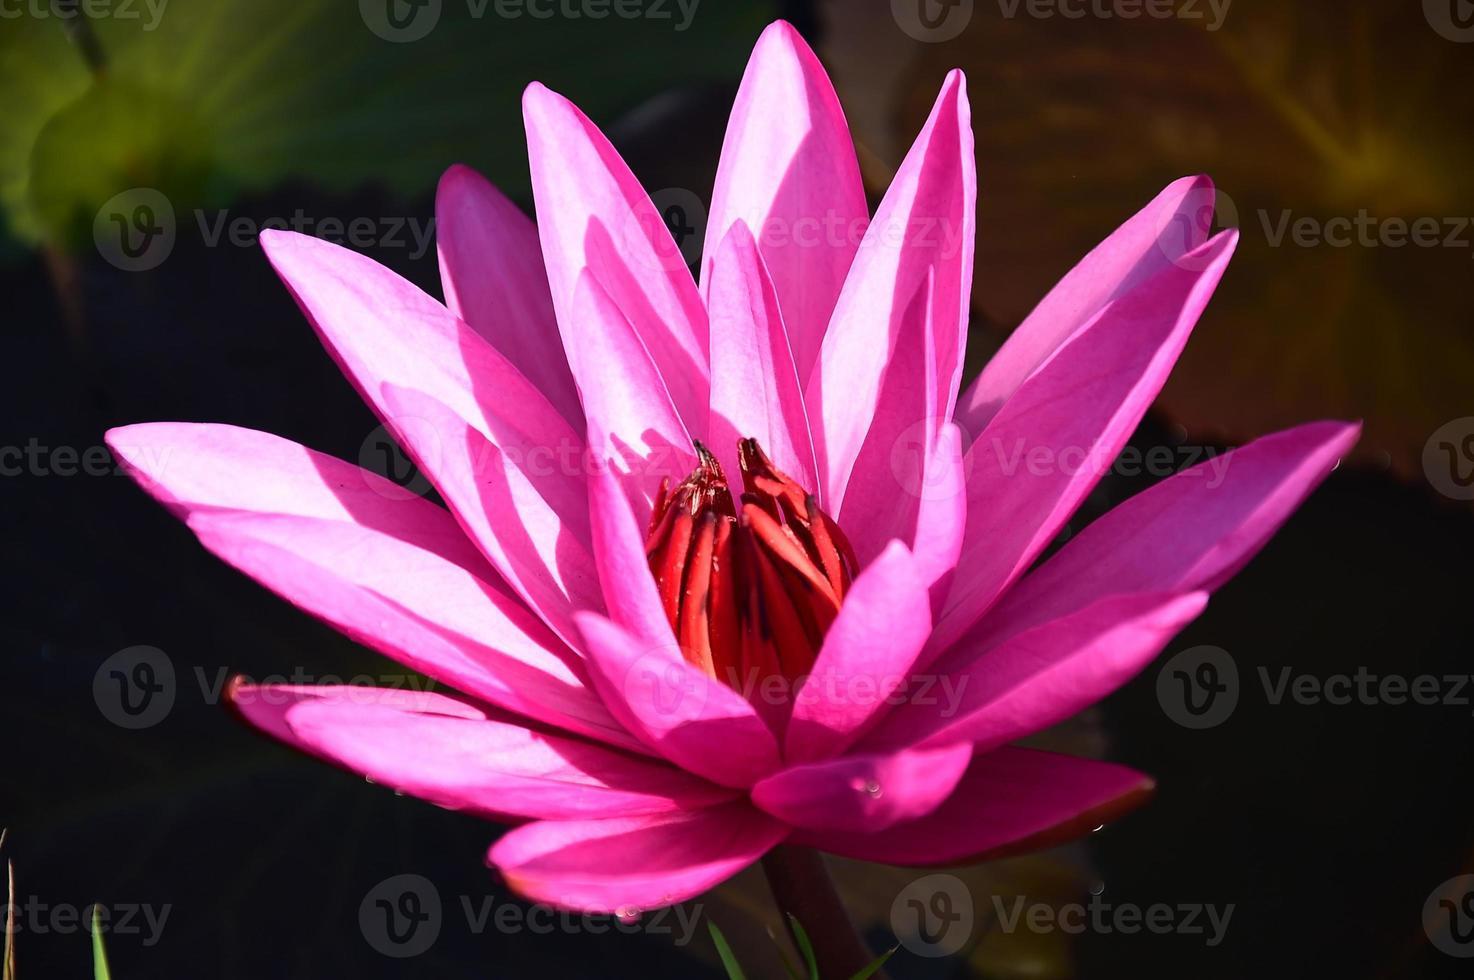 prachtige lotusbloem foto